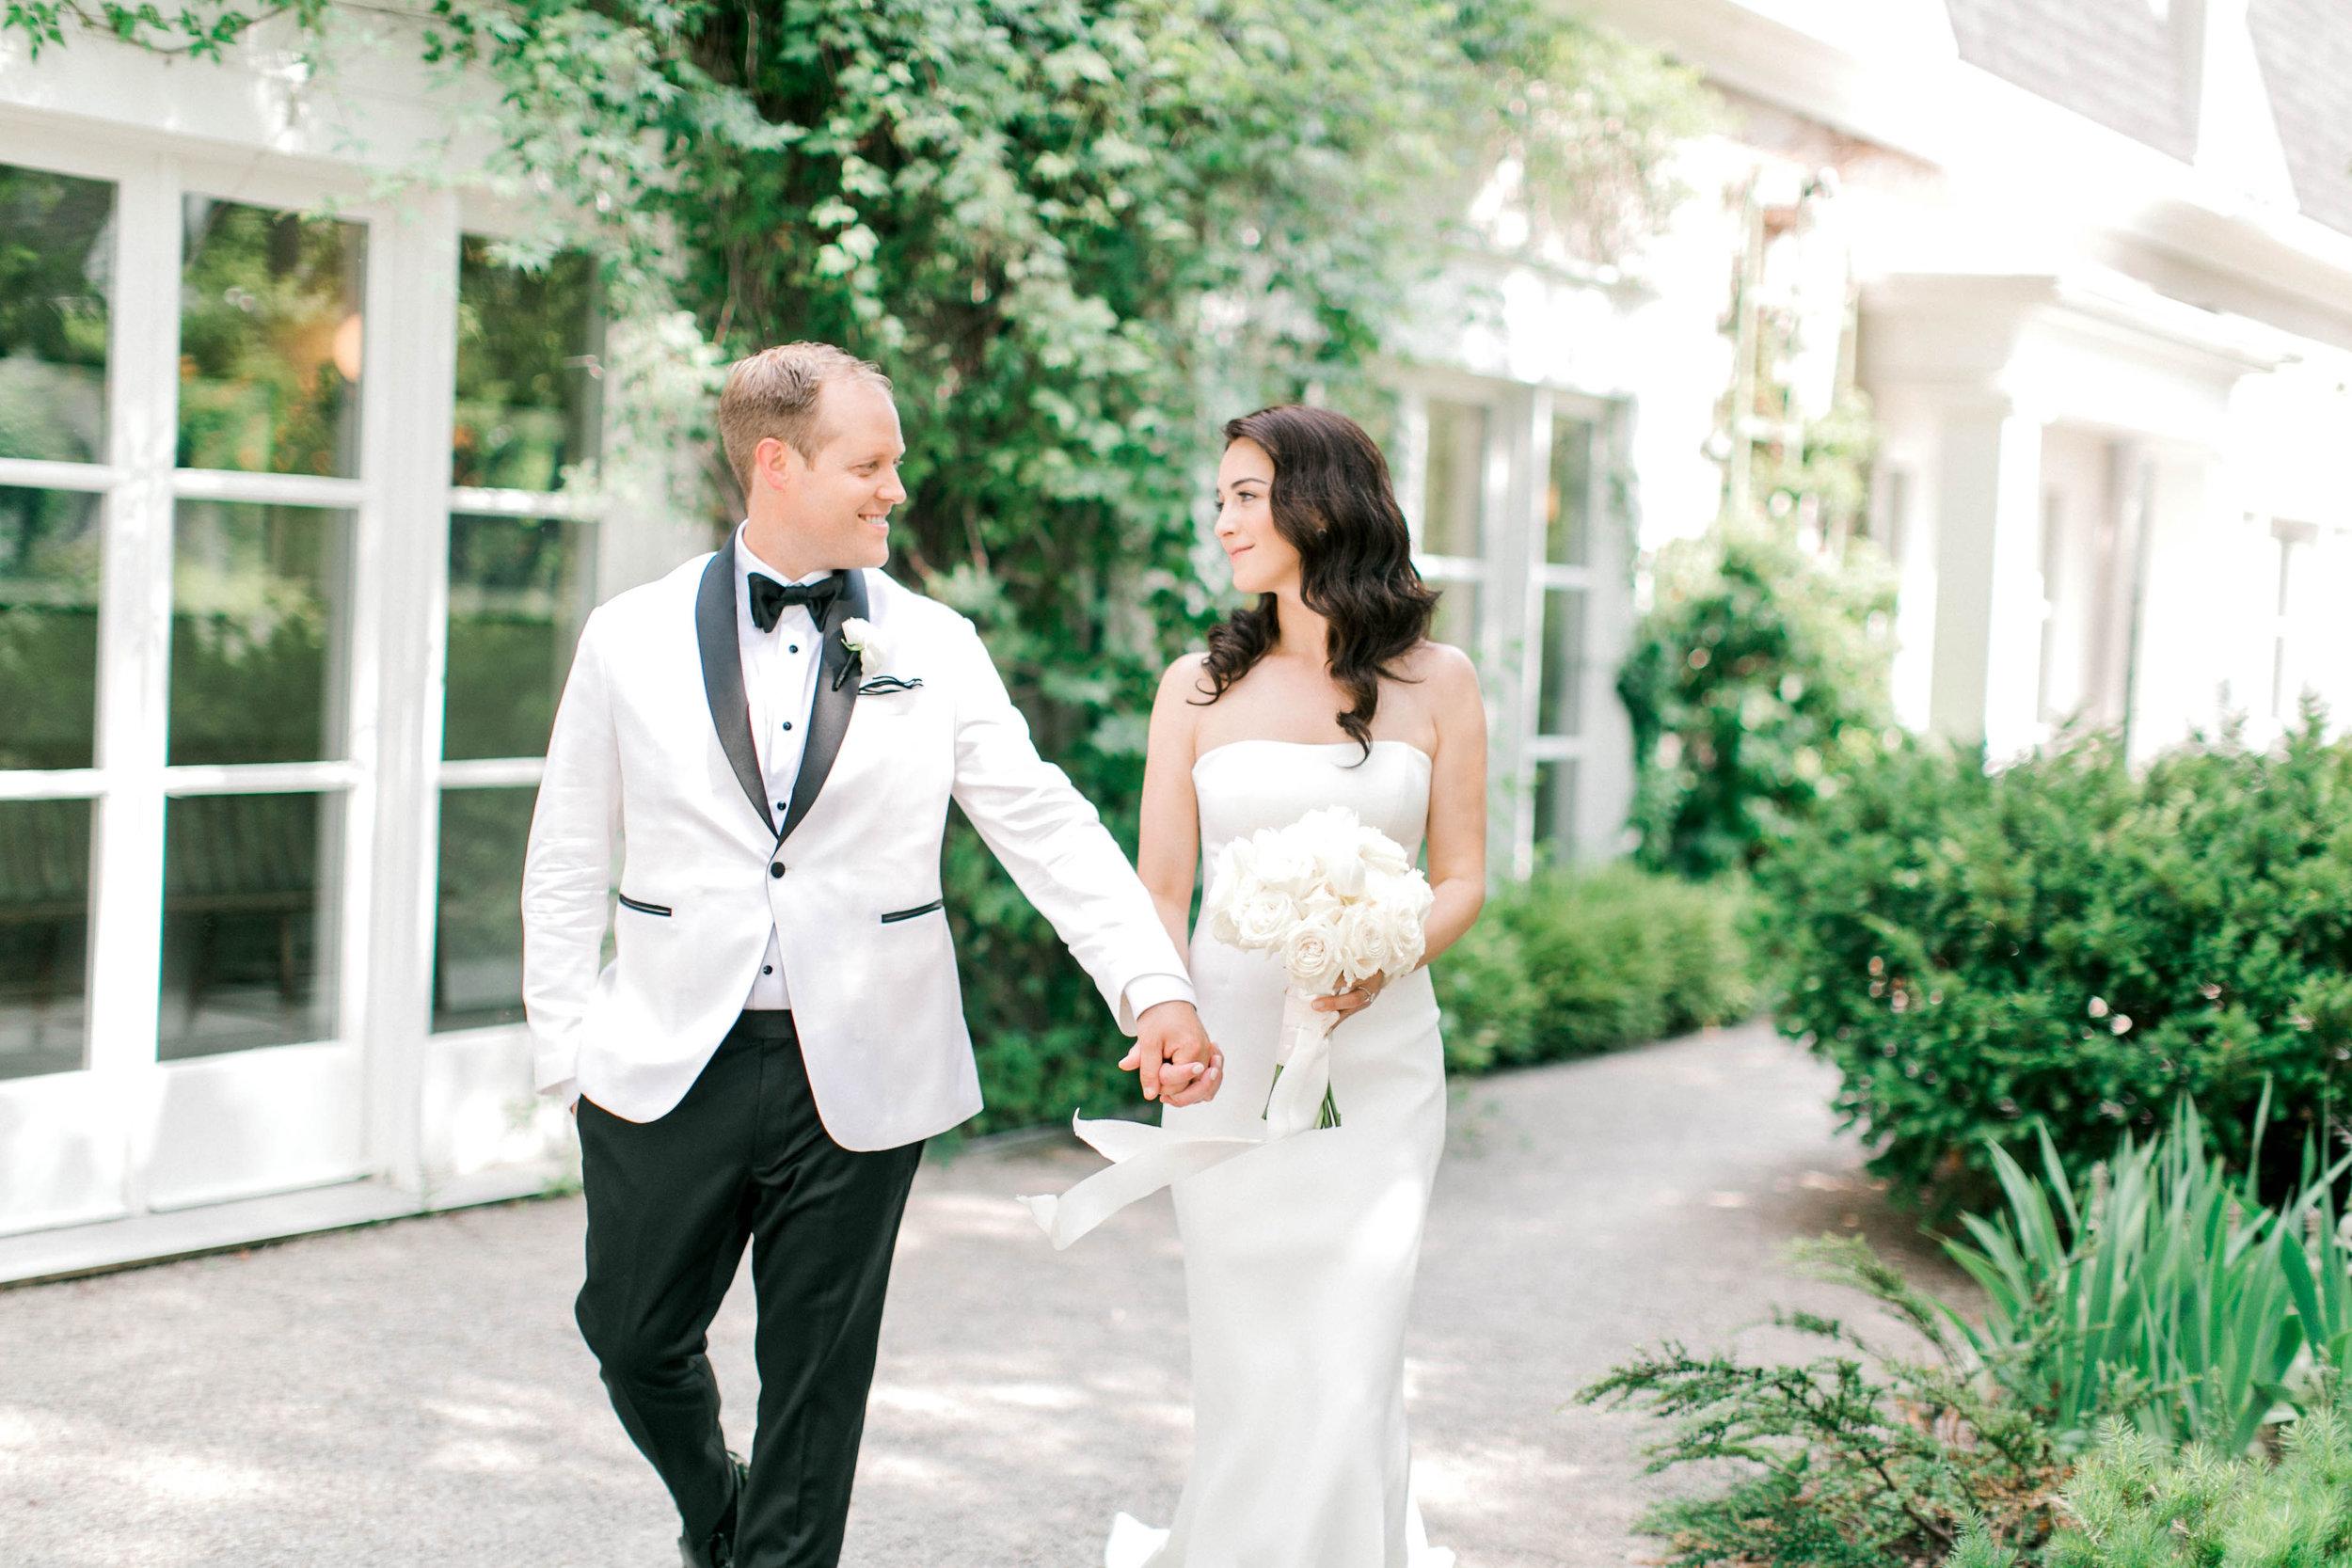 langdon-hall-wedding-photographer-soft-airy-kurtz-brooke-jon-314.jpg